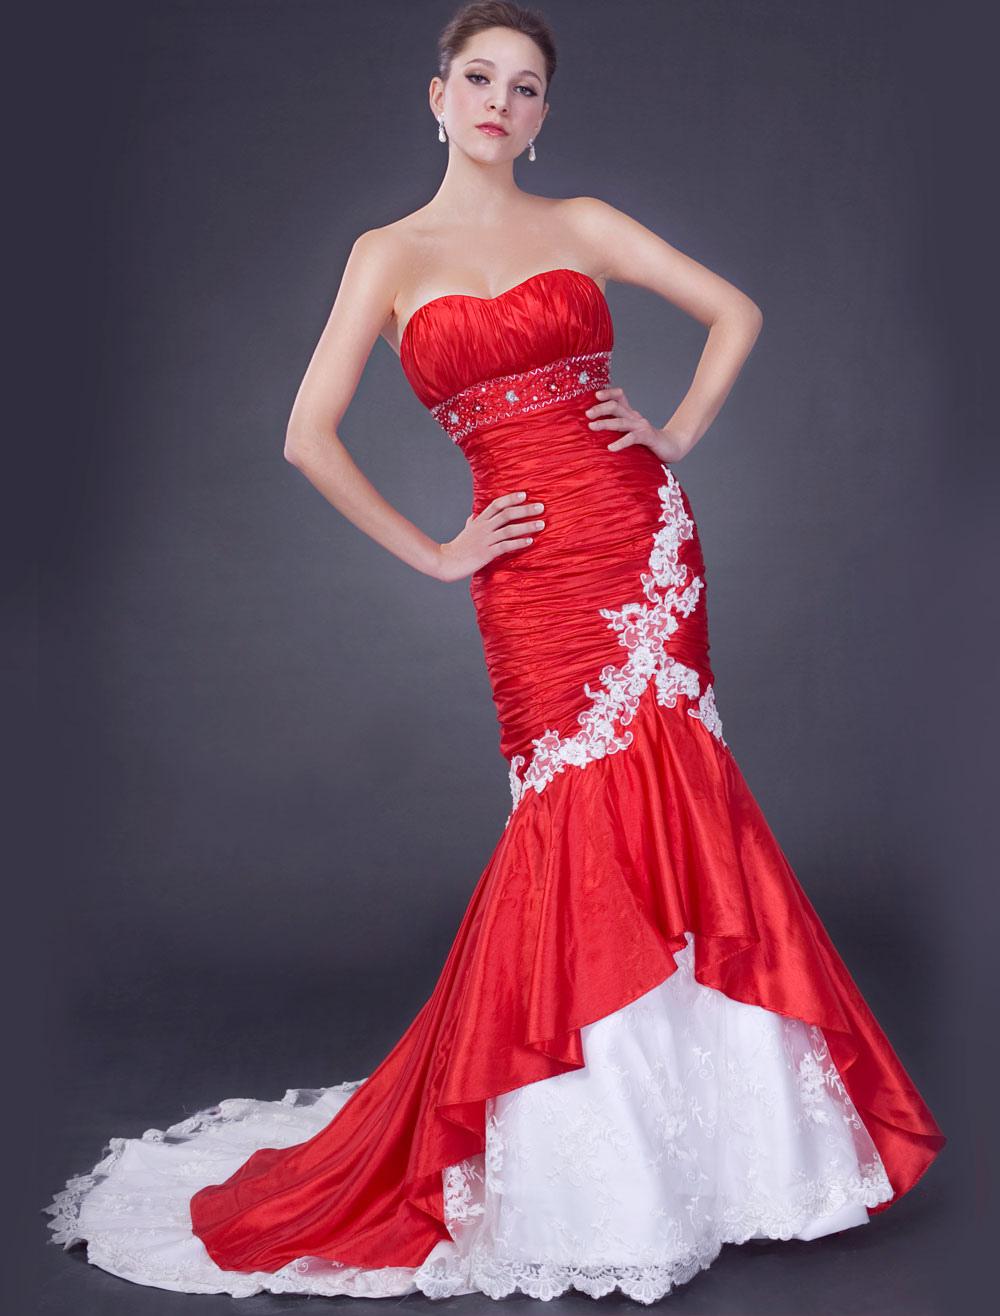 red sweetheart mermaid taffeta wedding dress p red wedding dress